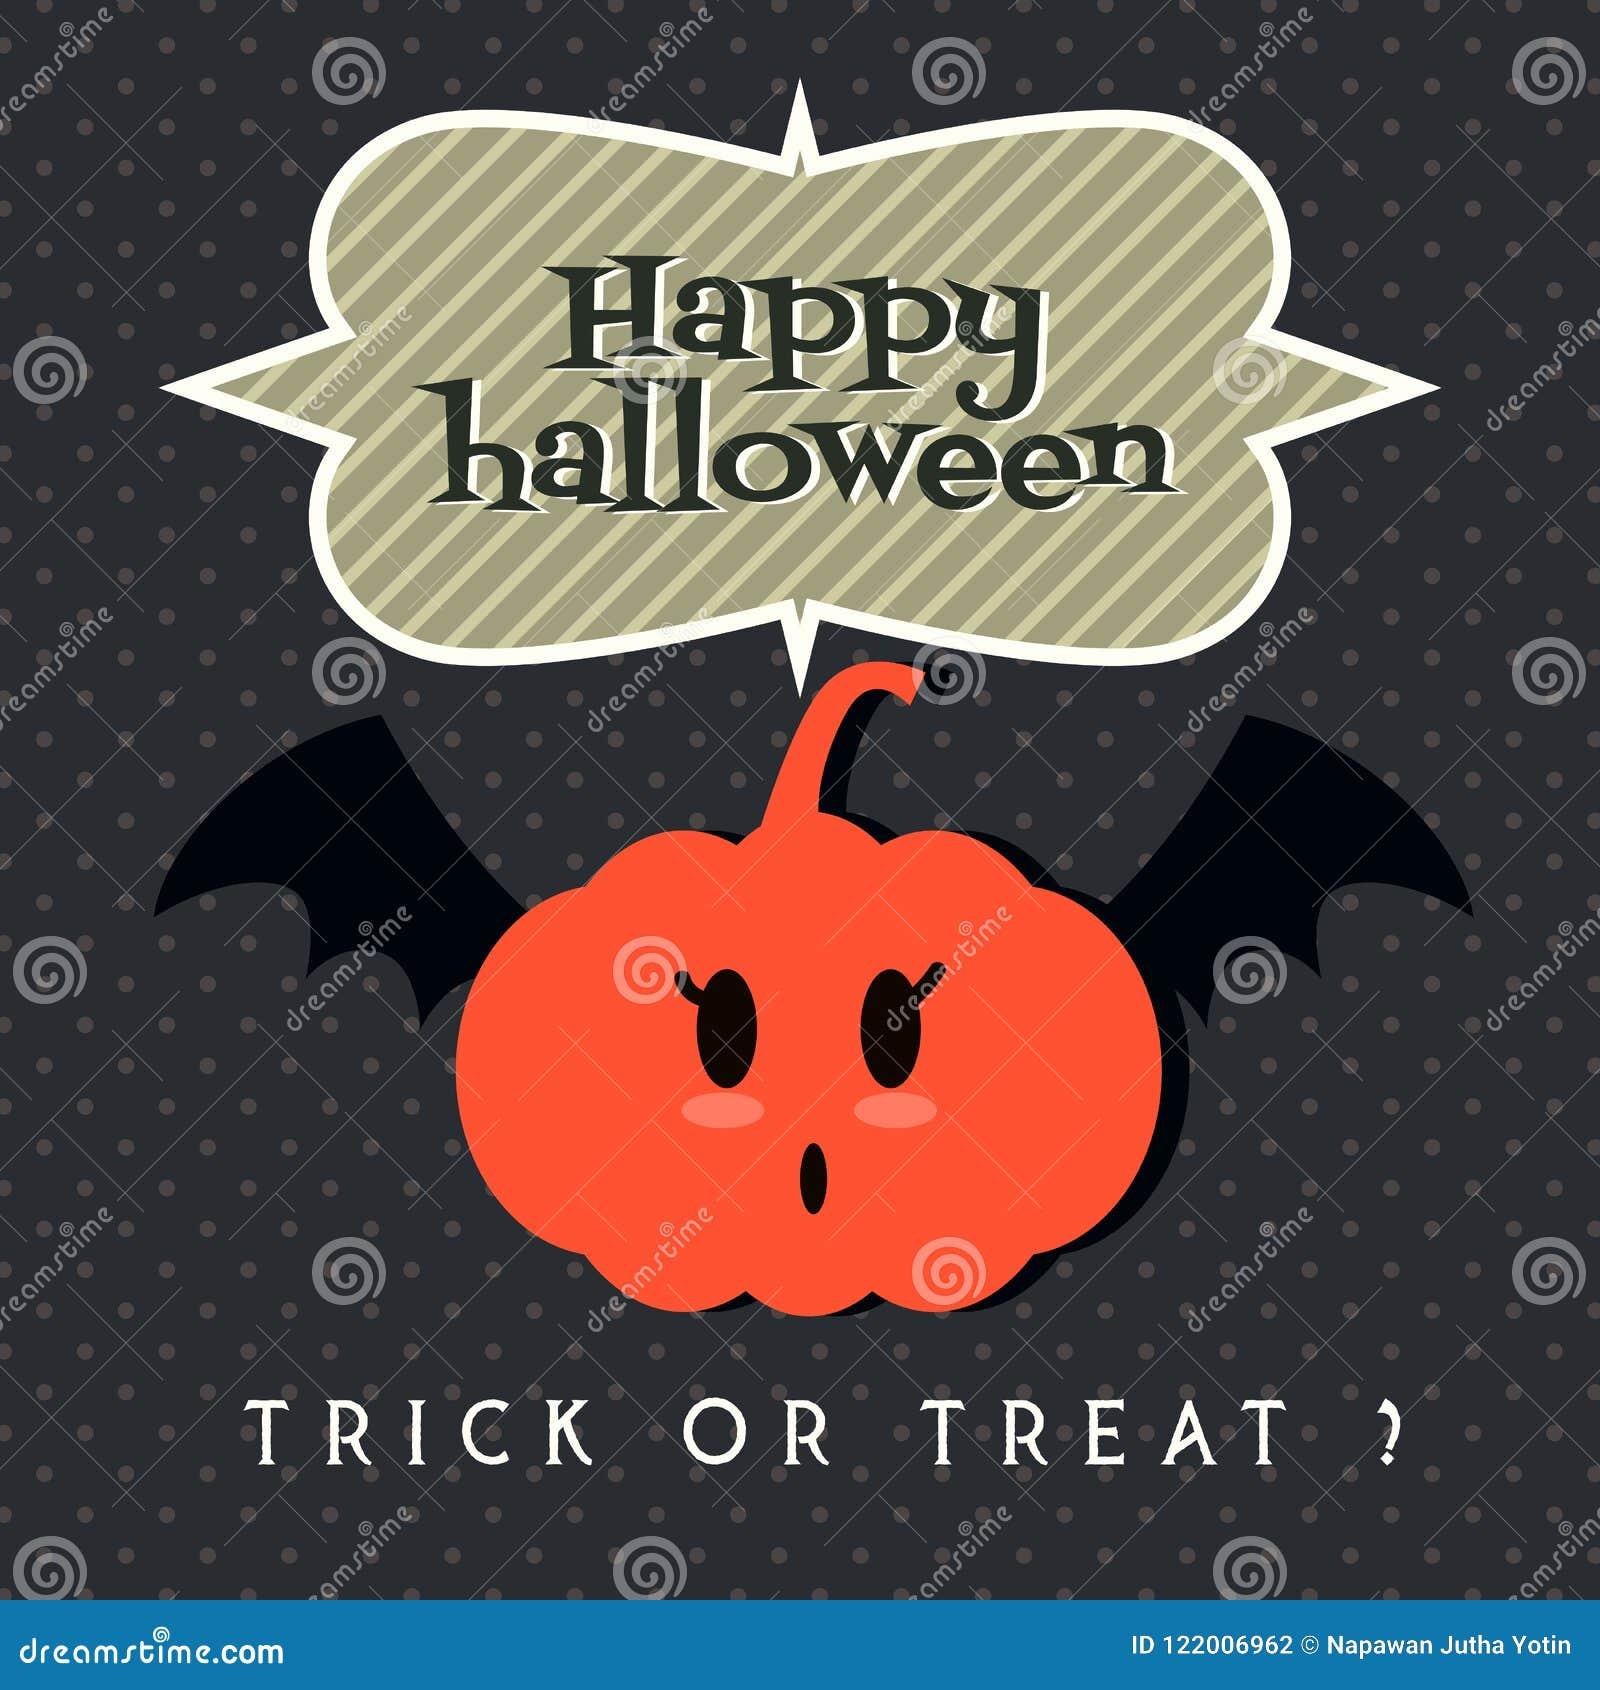 Cute Pumpkin With Bat`s Wing Cartoon Character Illustration